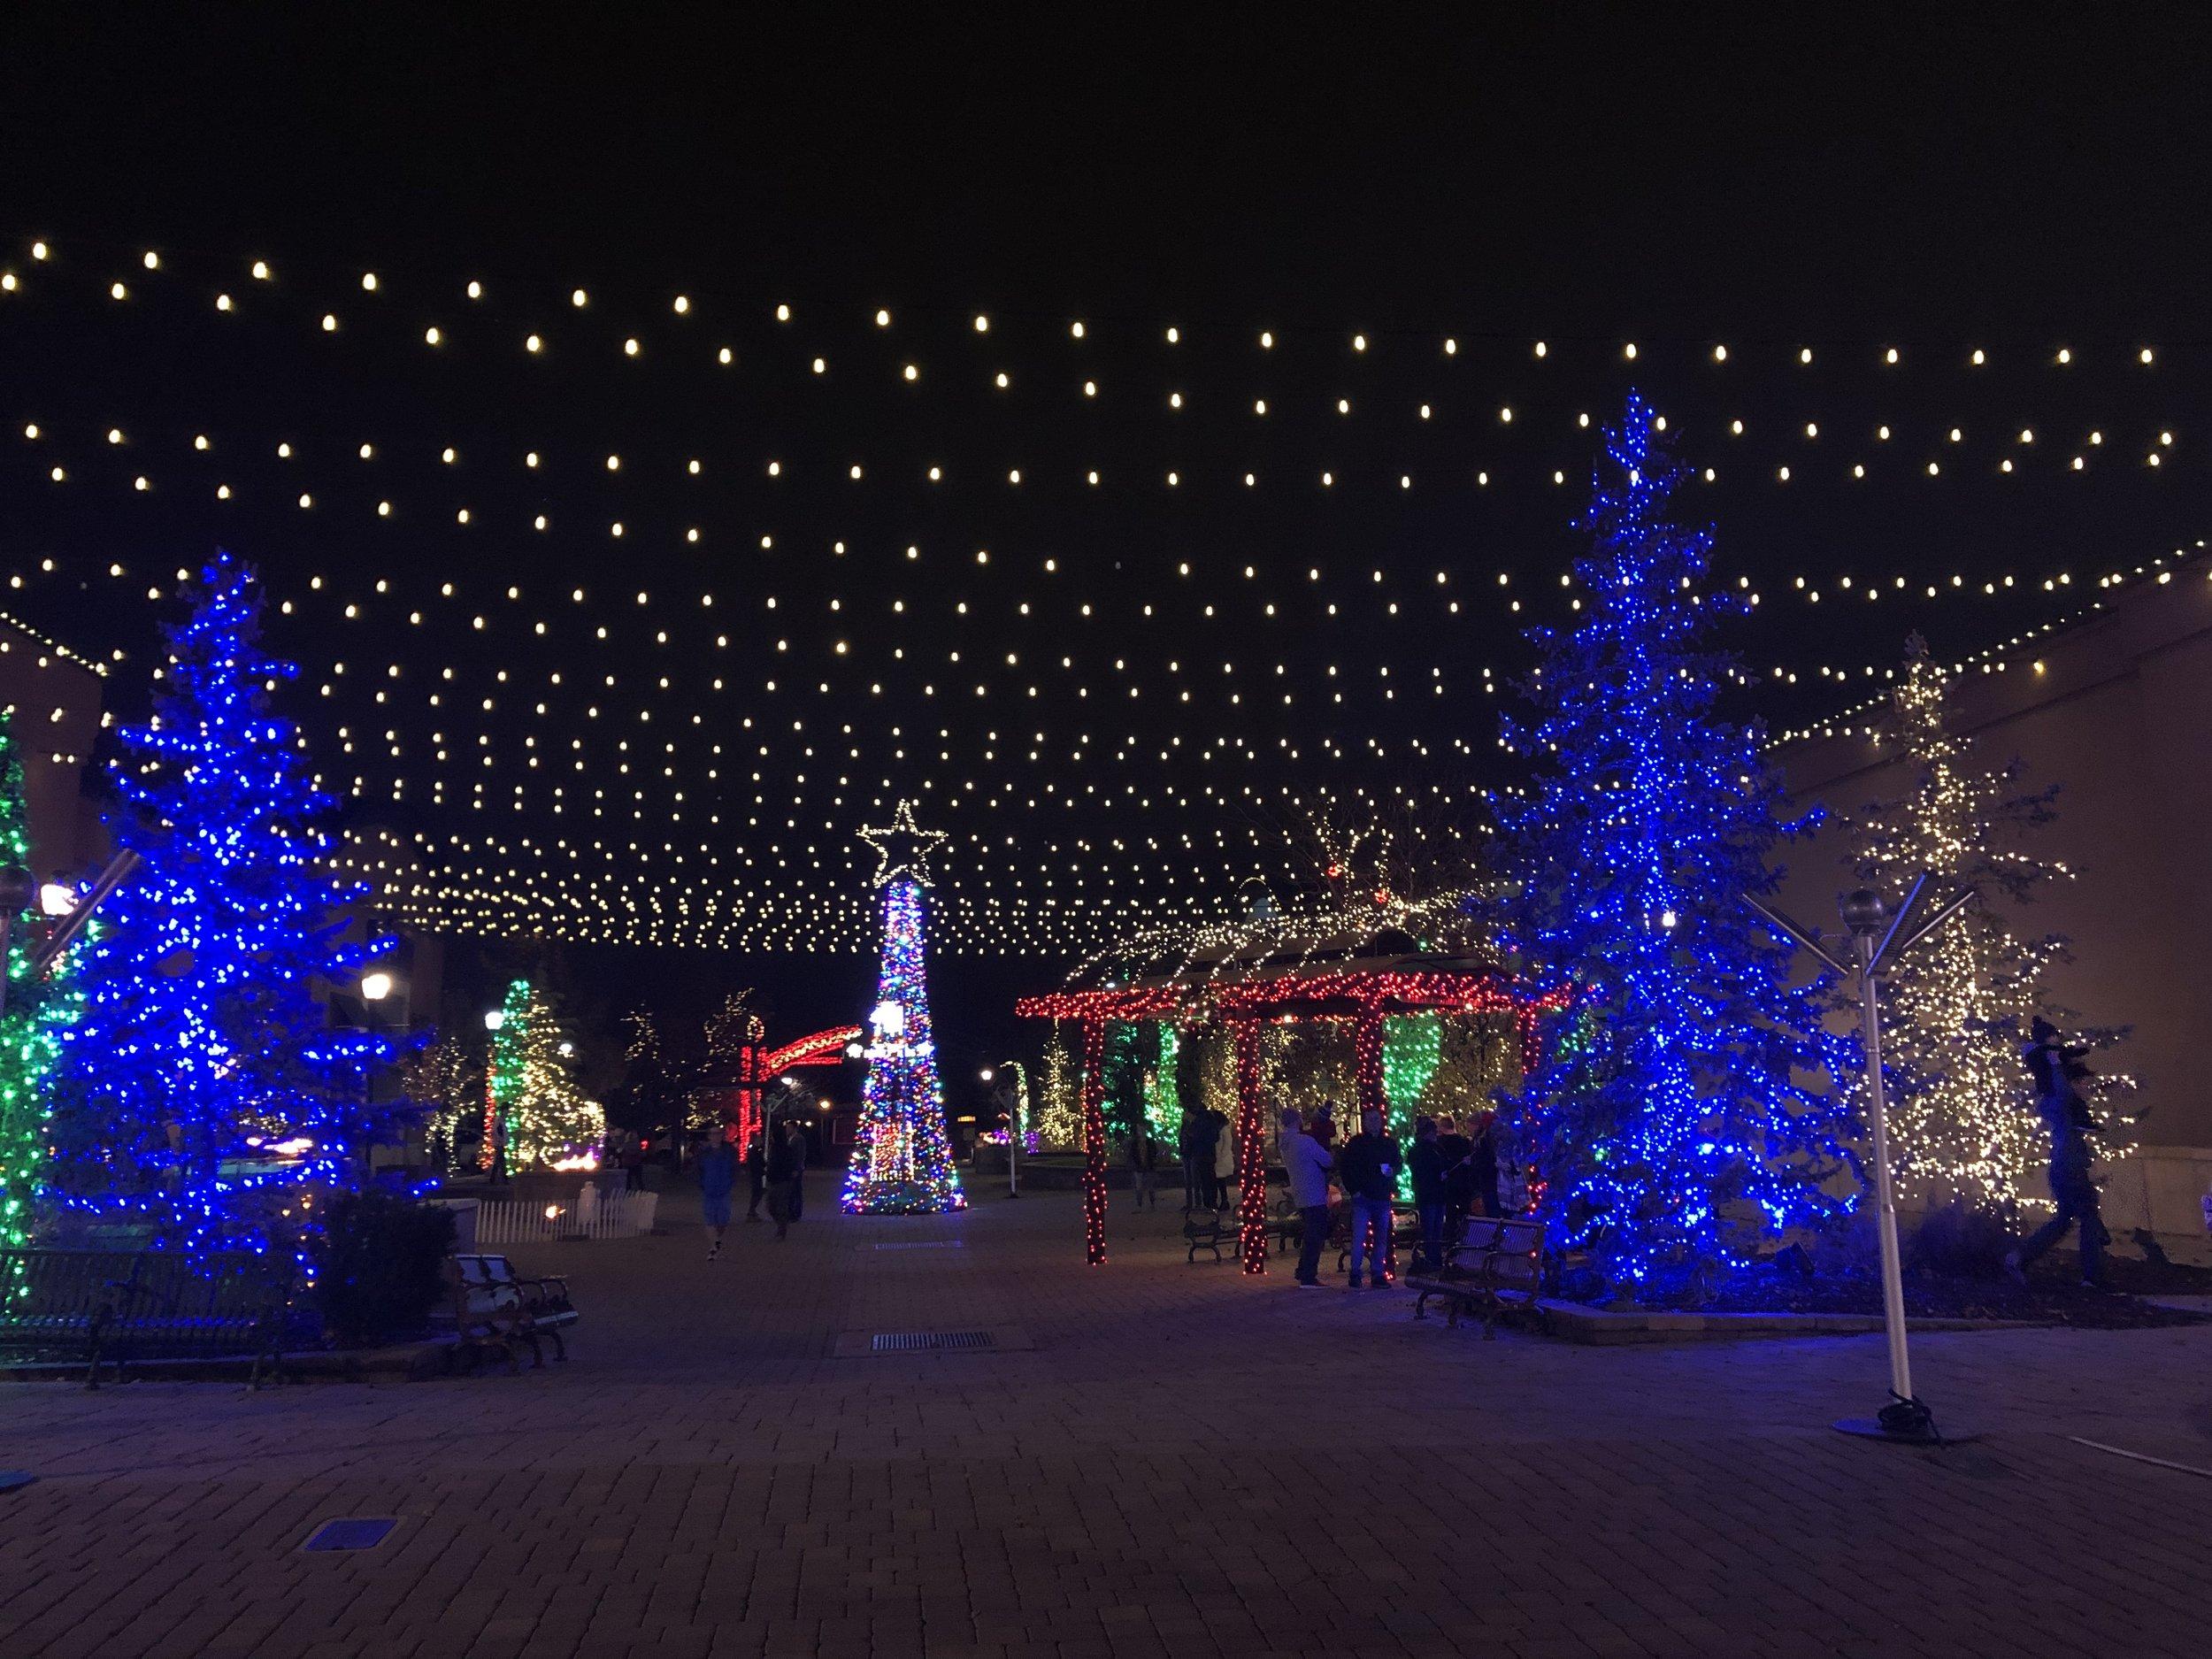 Hacken/Siegmund Christmas Letters - English Language:2018a - 2018b - 2017 - 2016 - 2015a - 2015b - 2014 - 2013 - 2012 - 2011 - 2010 - 2009 - 2008 - 2005 - 2004 - 2003 - 2002 - 2001 - 1999 - 1998 - 1995 - 1994German Language:2018 - 2017 - 2013 - 2011 - 2010 - 2009 - 2008 - 2005 - 2004 - 2003 - 2001 - 2000